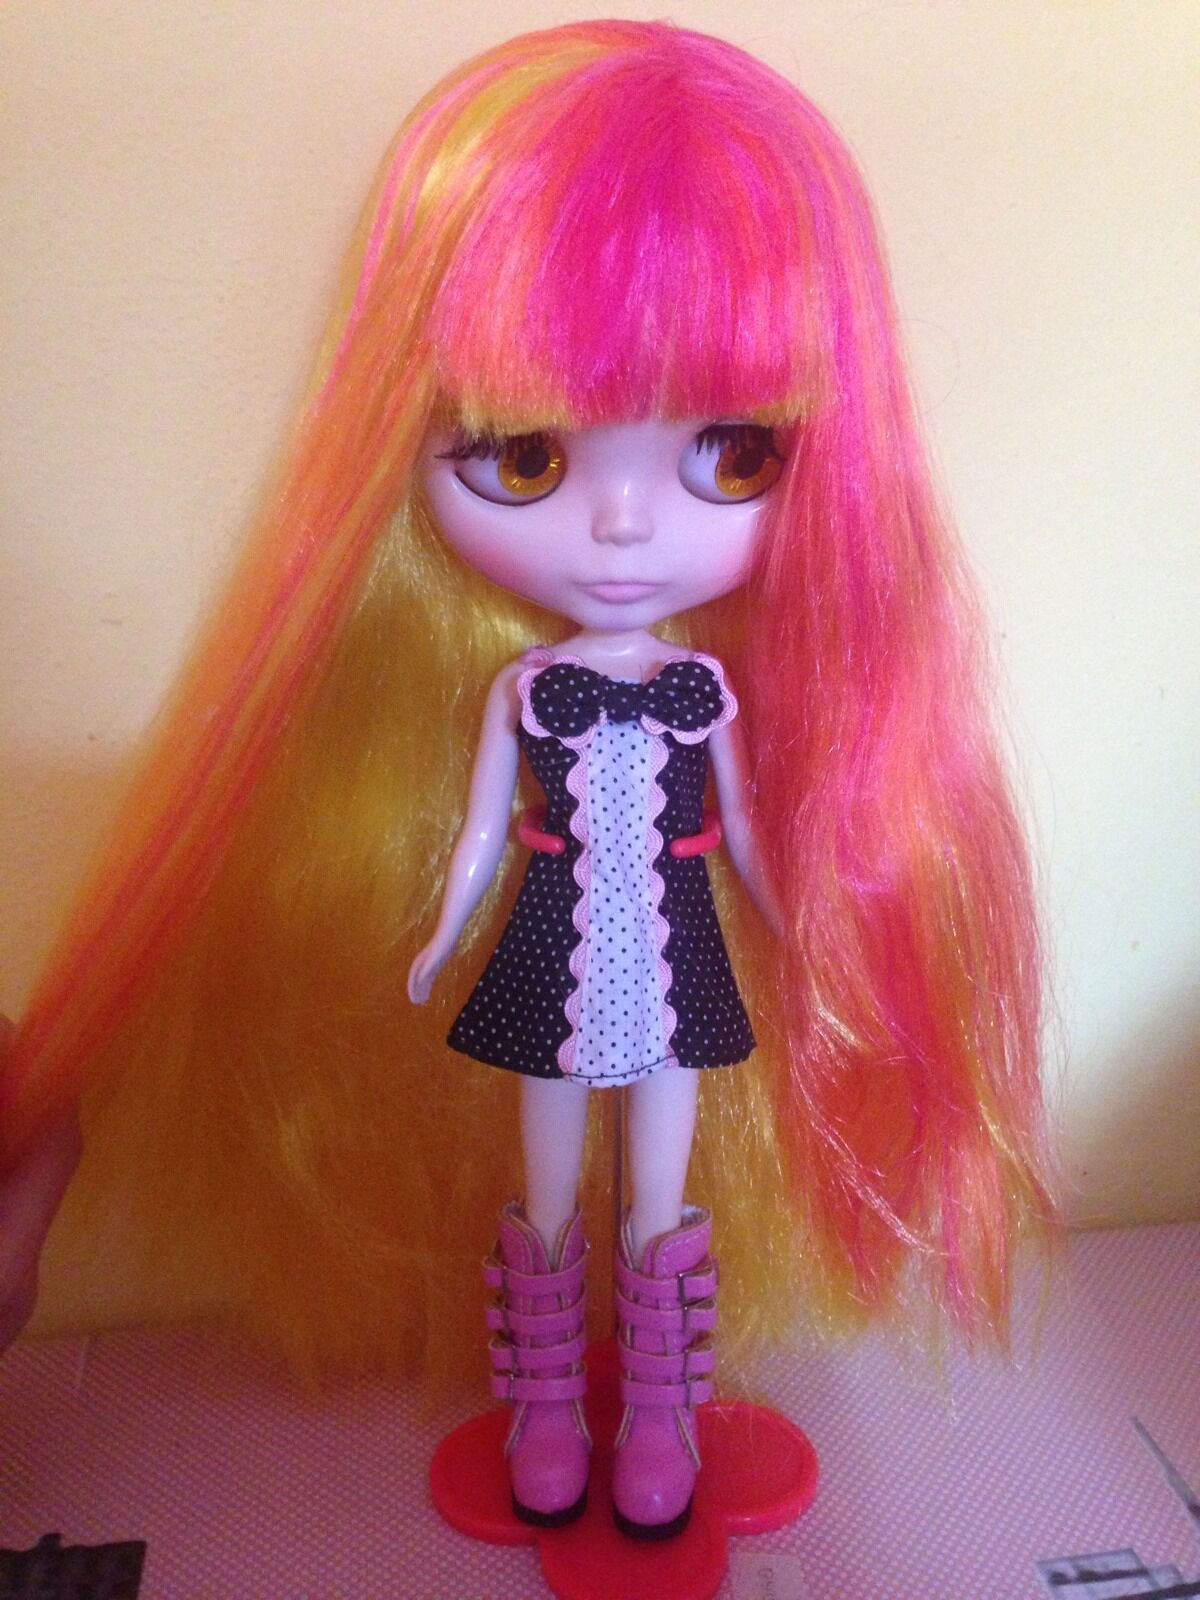 NEO Blythe TAKARA TOMY 12  Bambola Capelli Color Tramonto gialli, Arancio, Fuxia